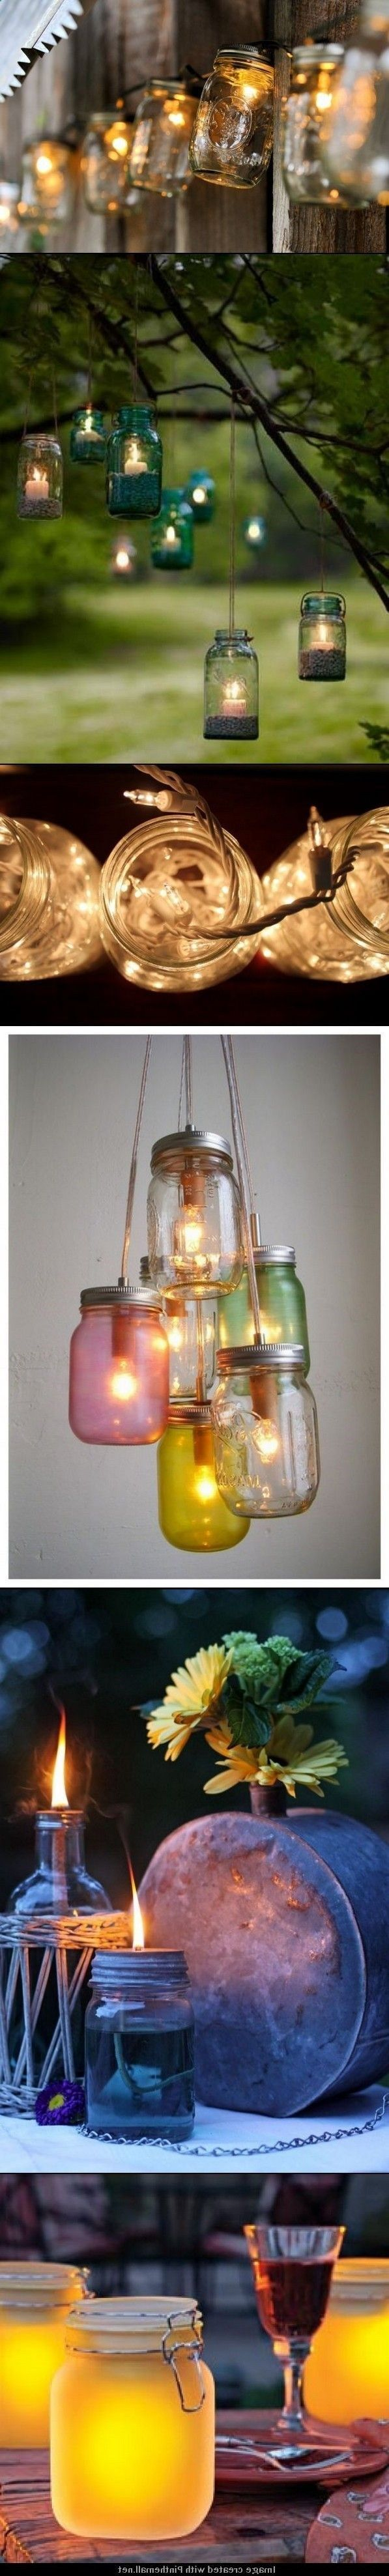 The 101 best Light fixtures images on Pinterest